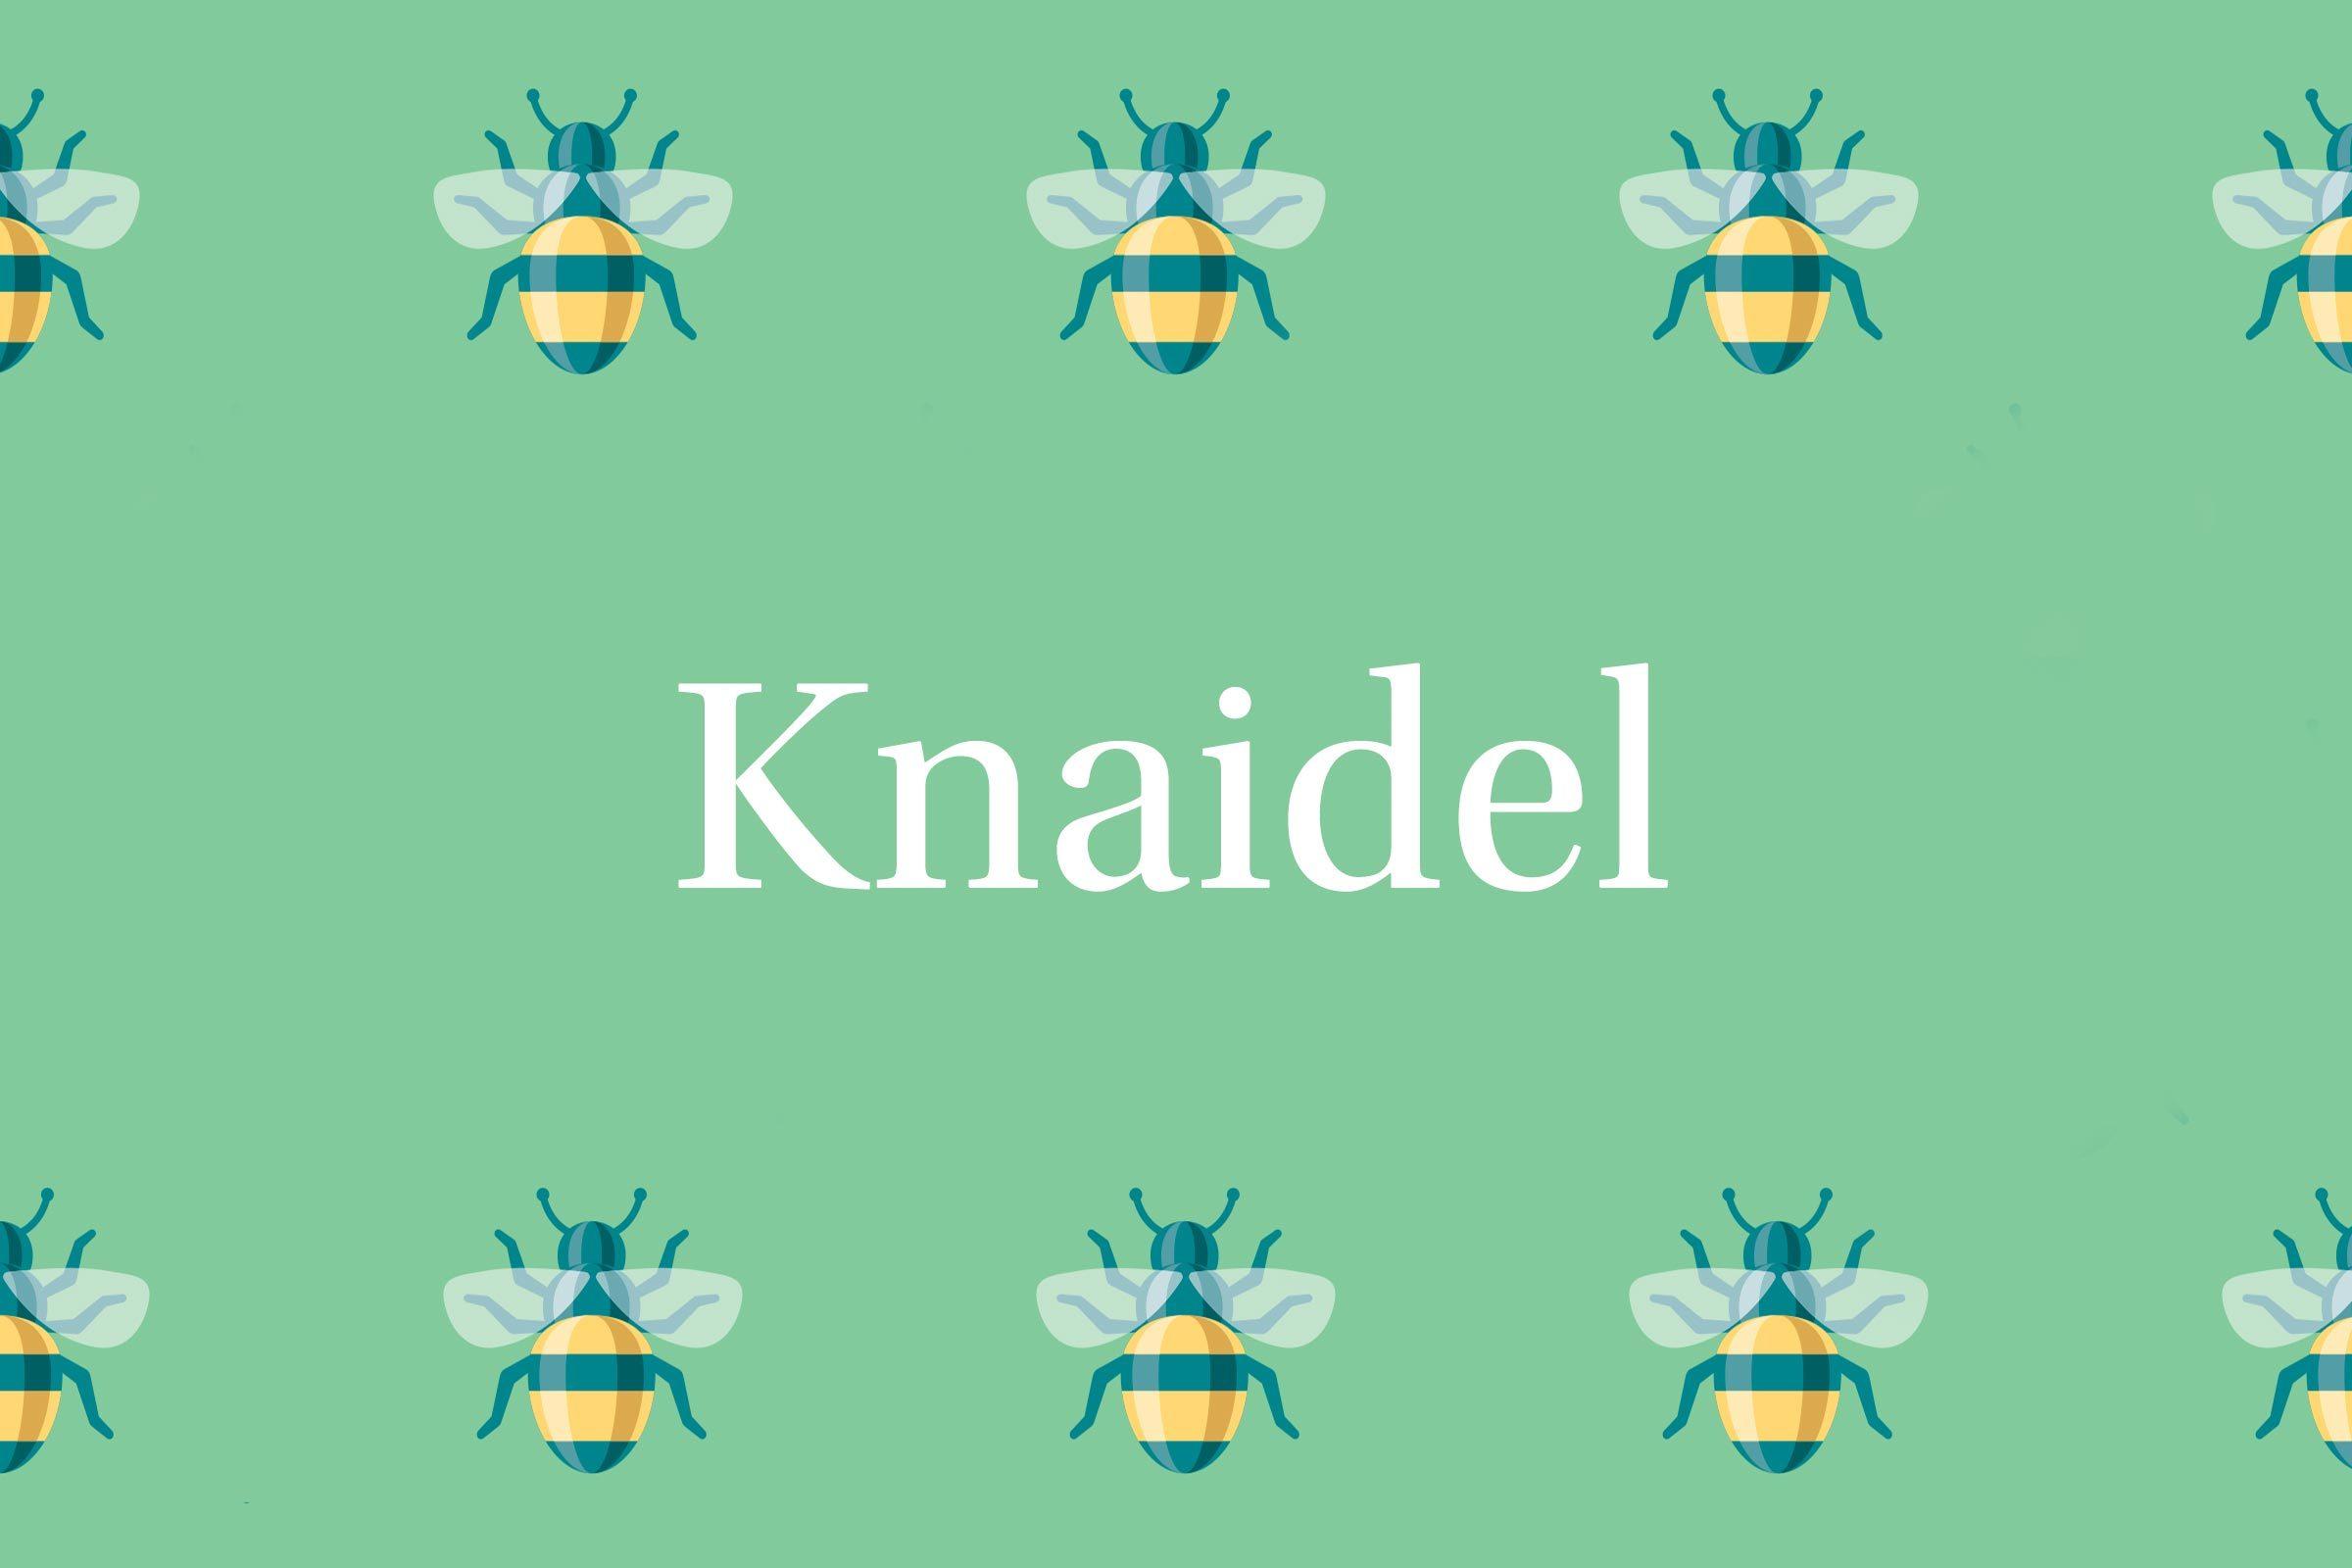 Knaidel